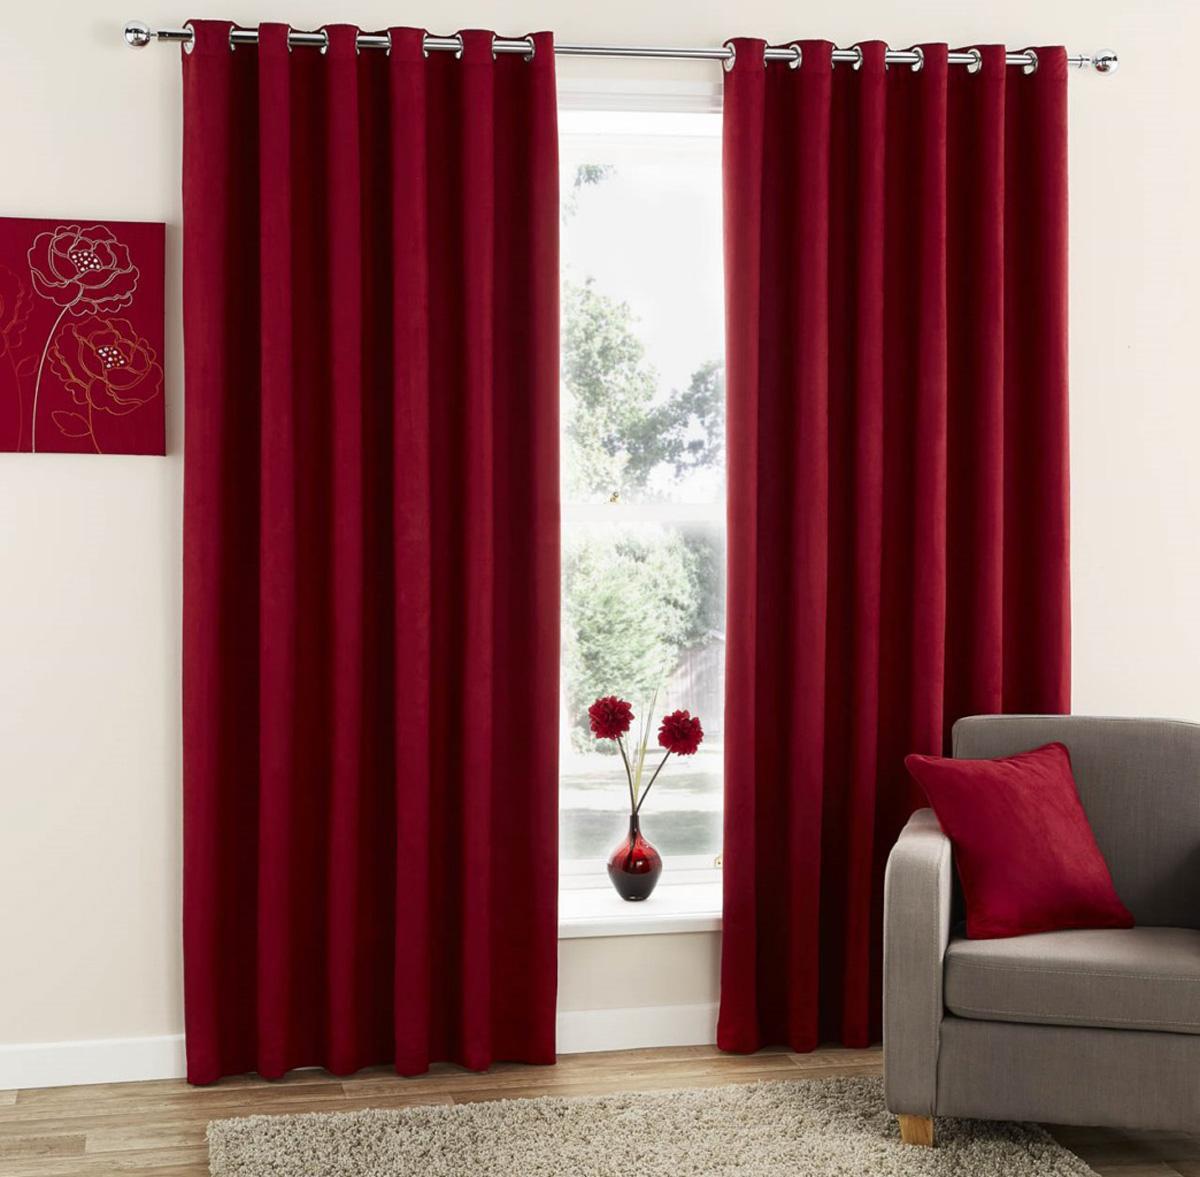 Plum curtains - Redfrom 23 63